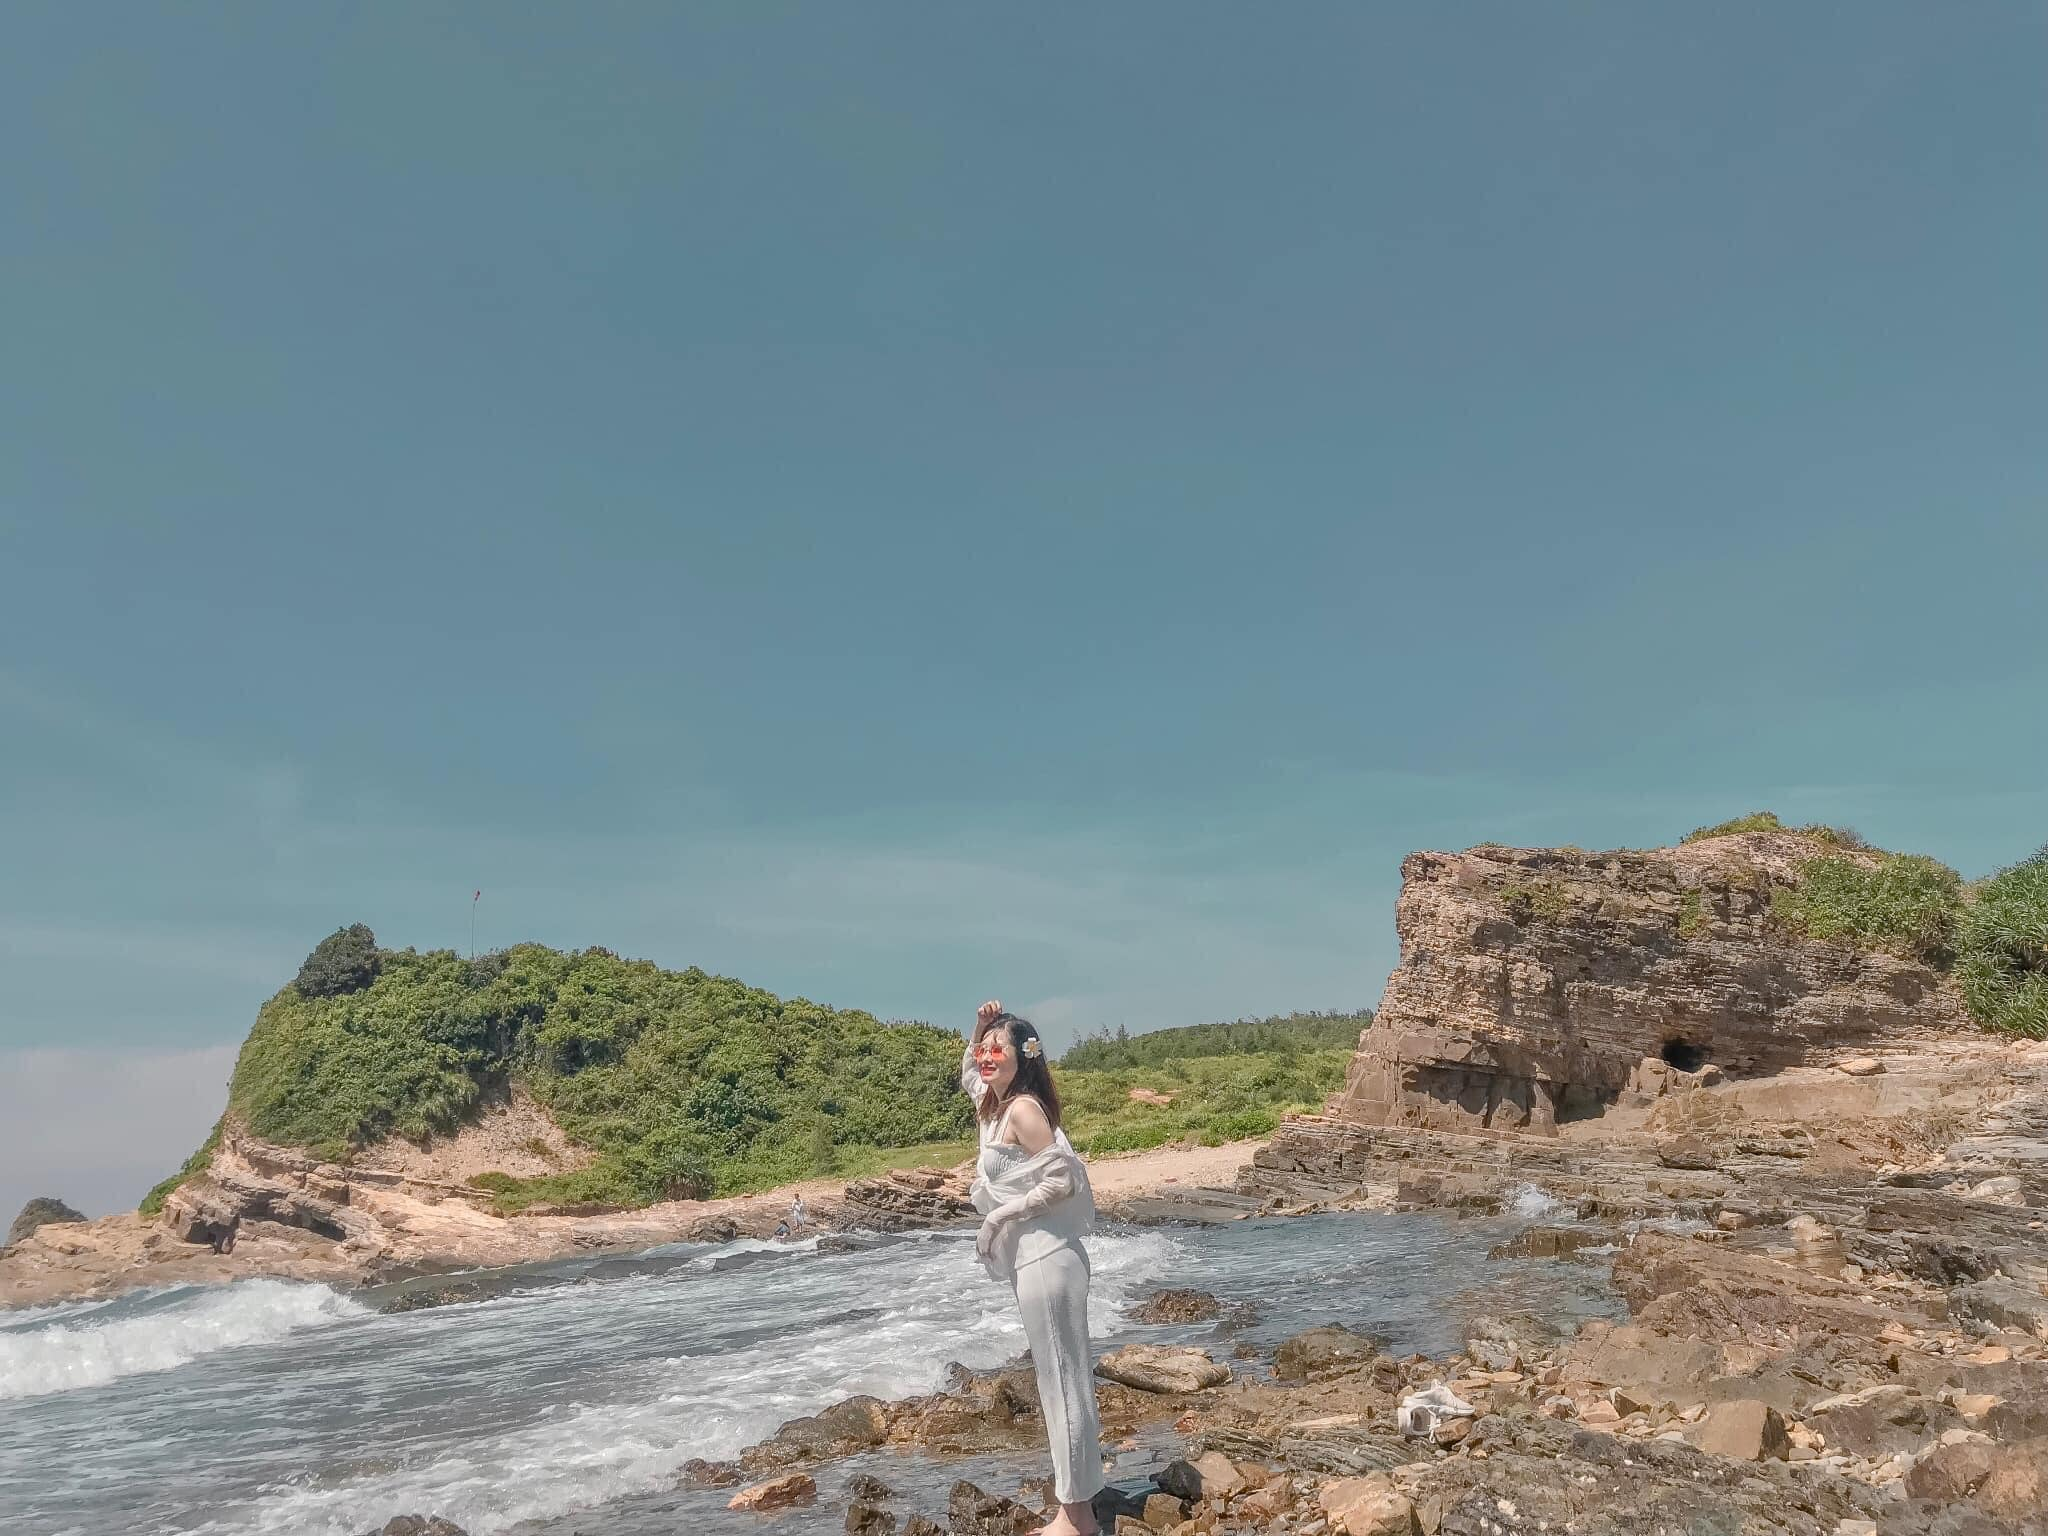 xung-xinh-checkin-nhung-bai-tam-dep-o-co-to-vietmountain-travel5